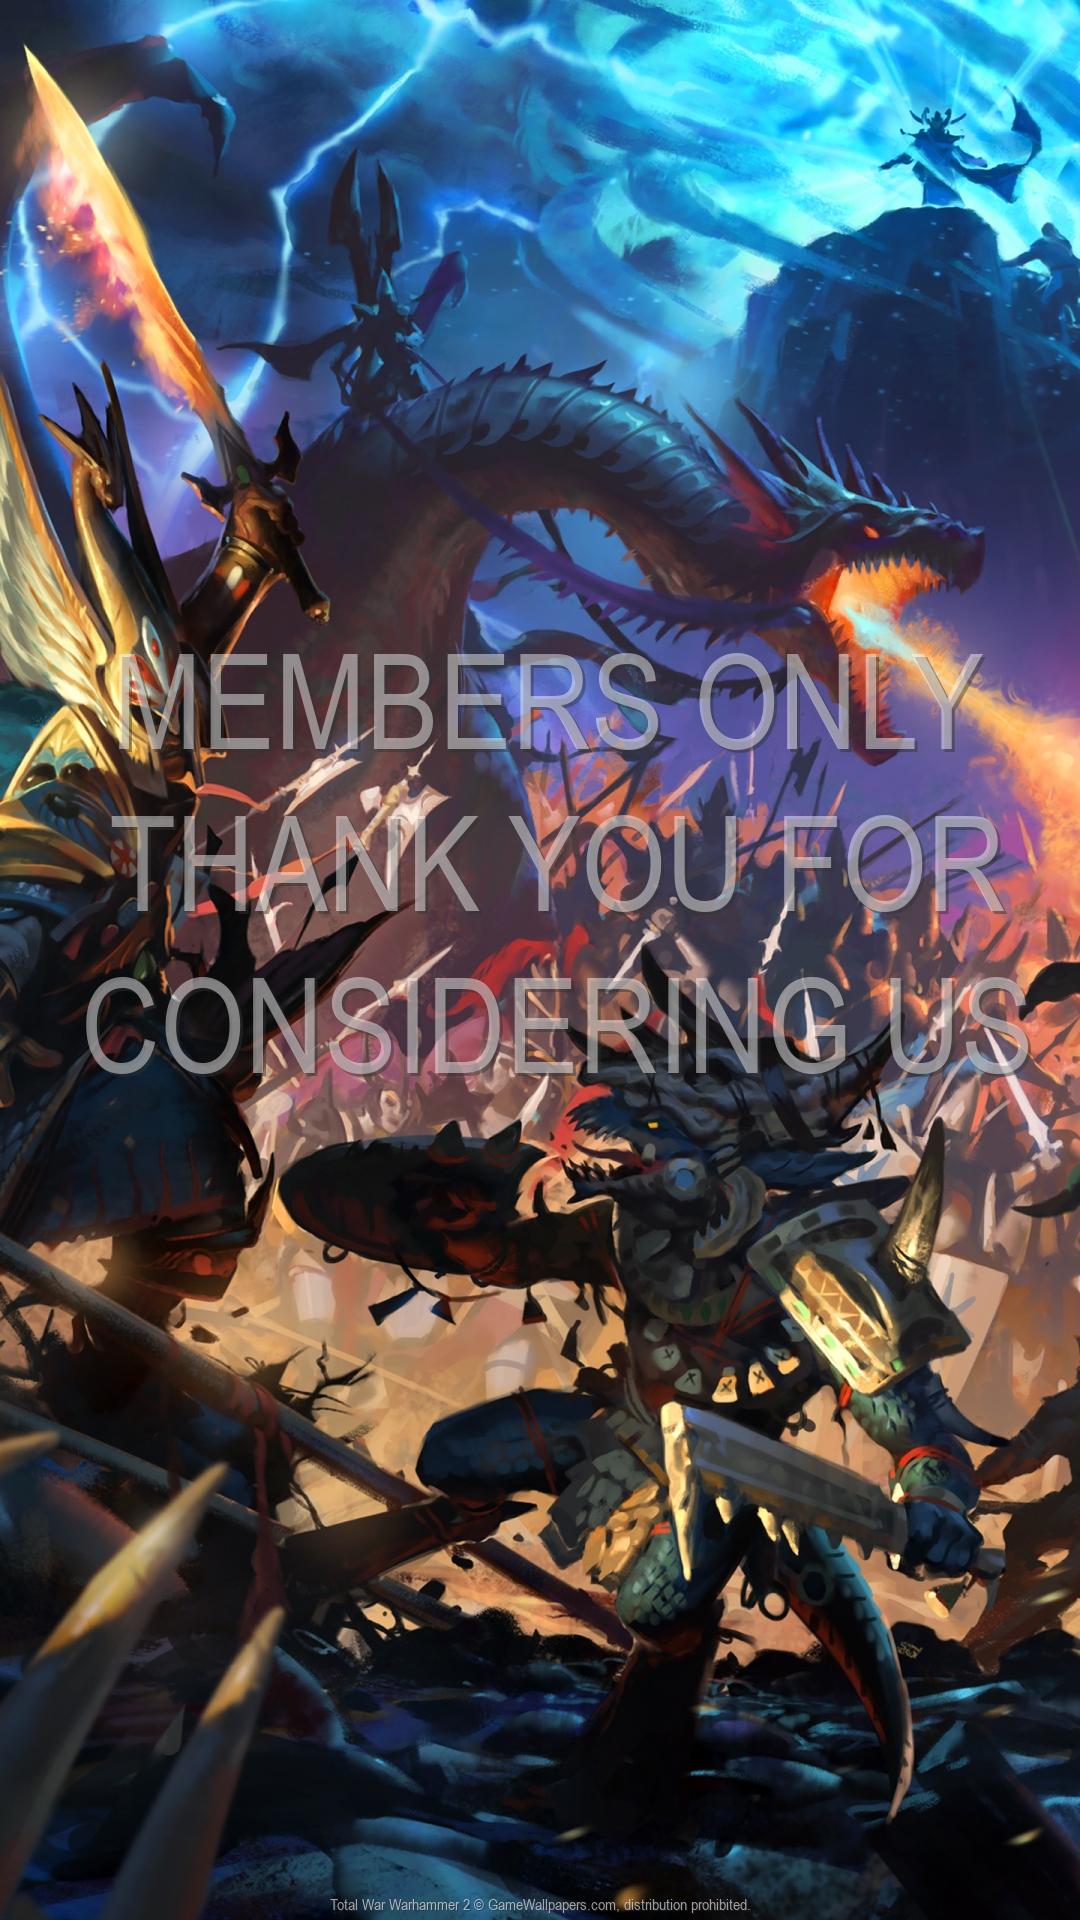 Total War Warhammer Ii 2017 Promotional Art Mobygames